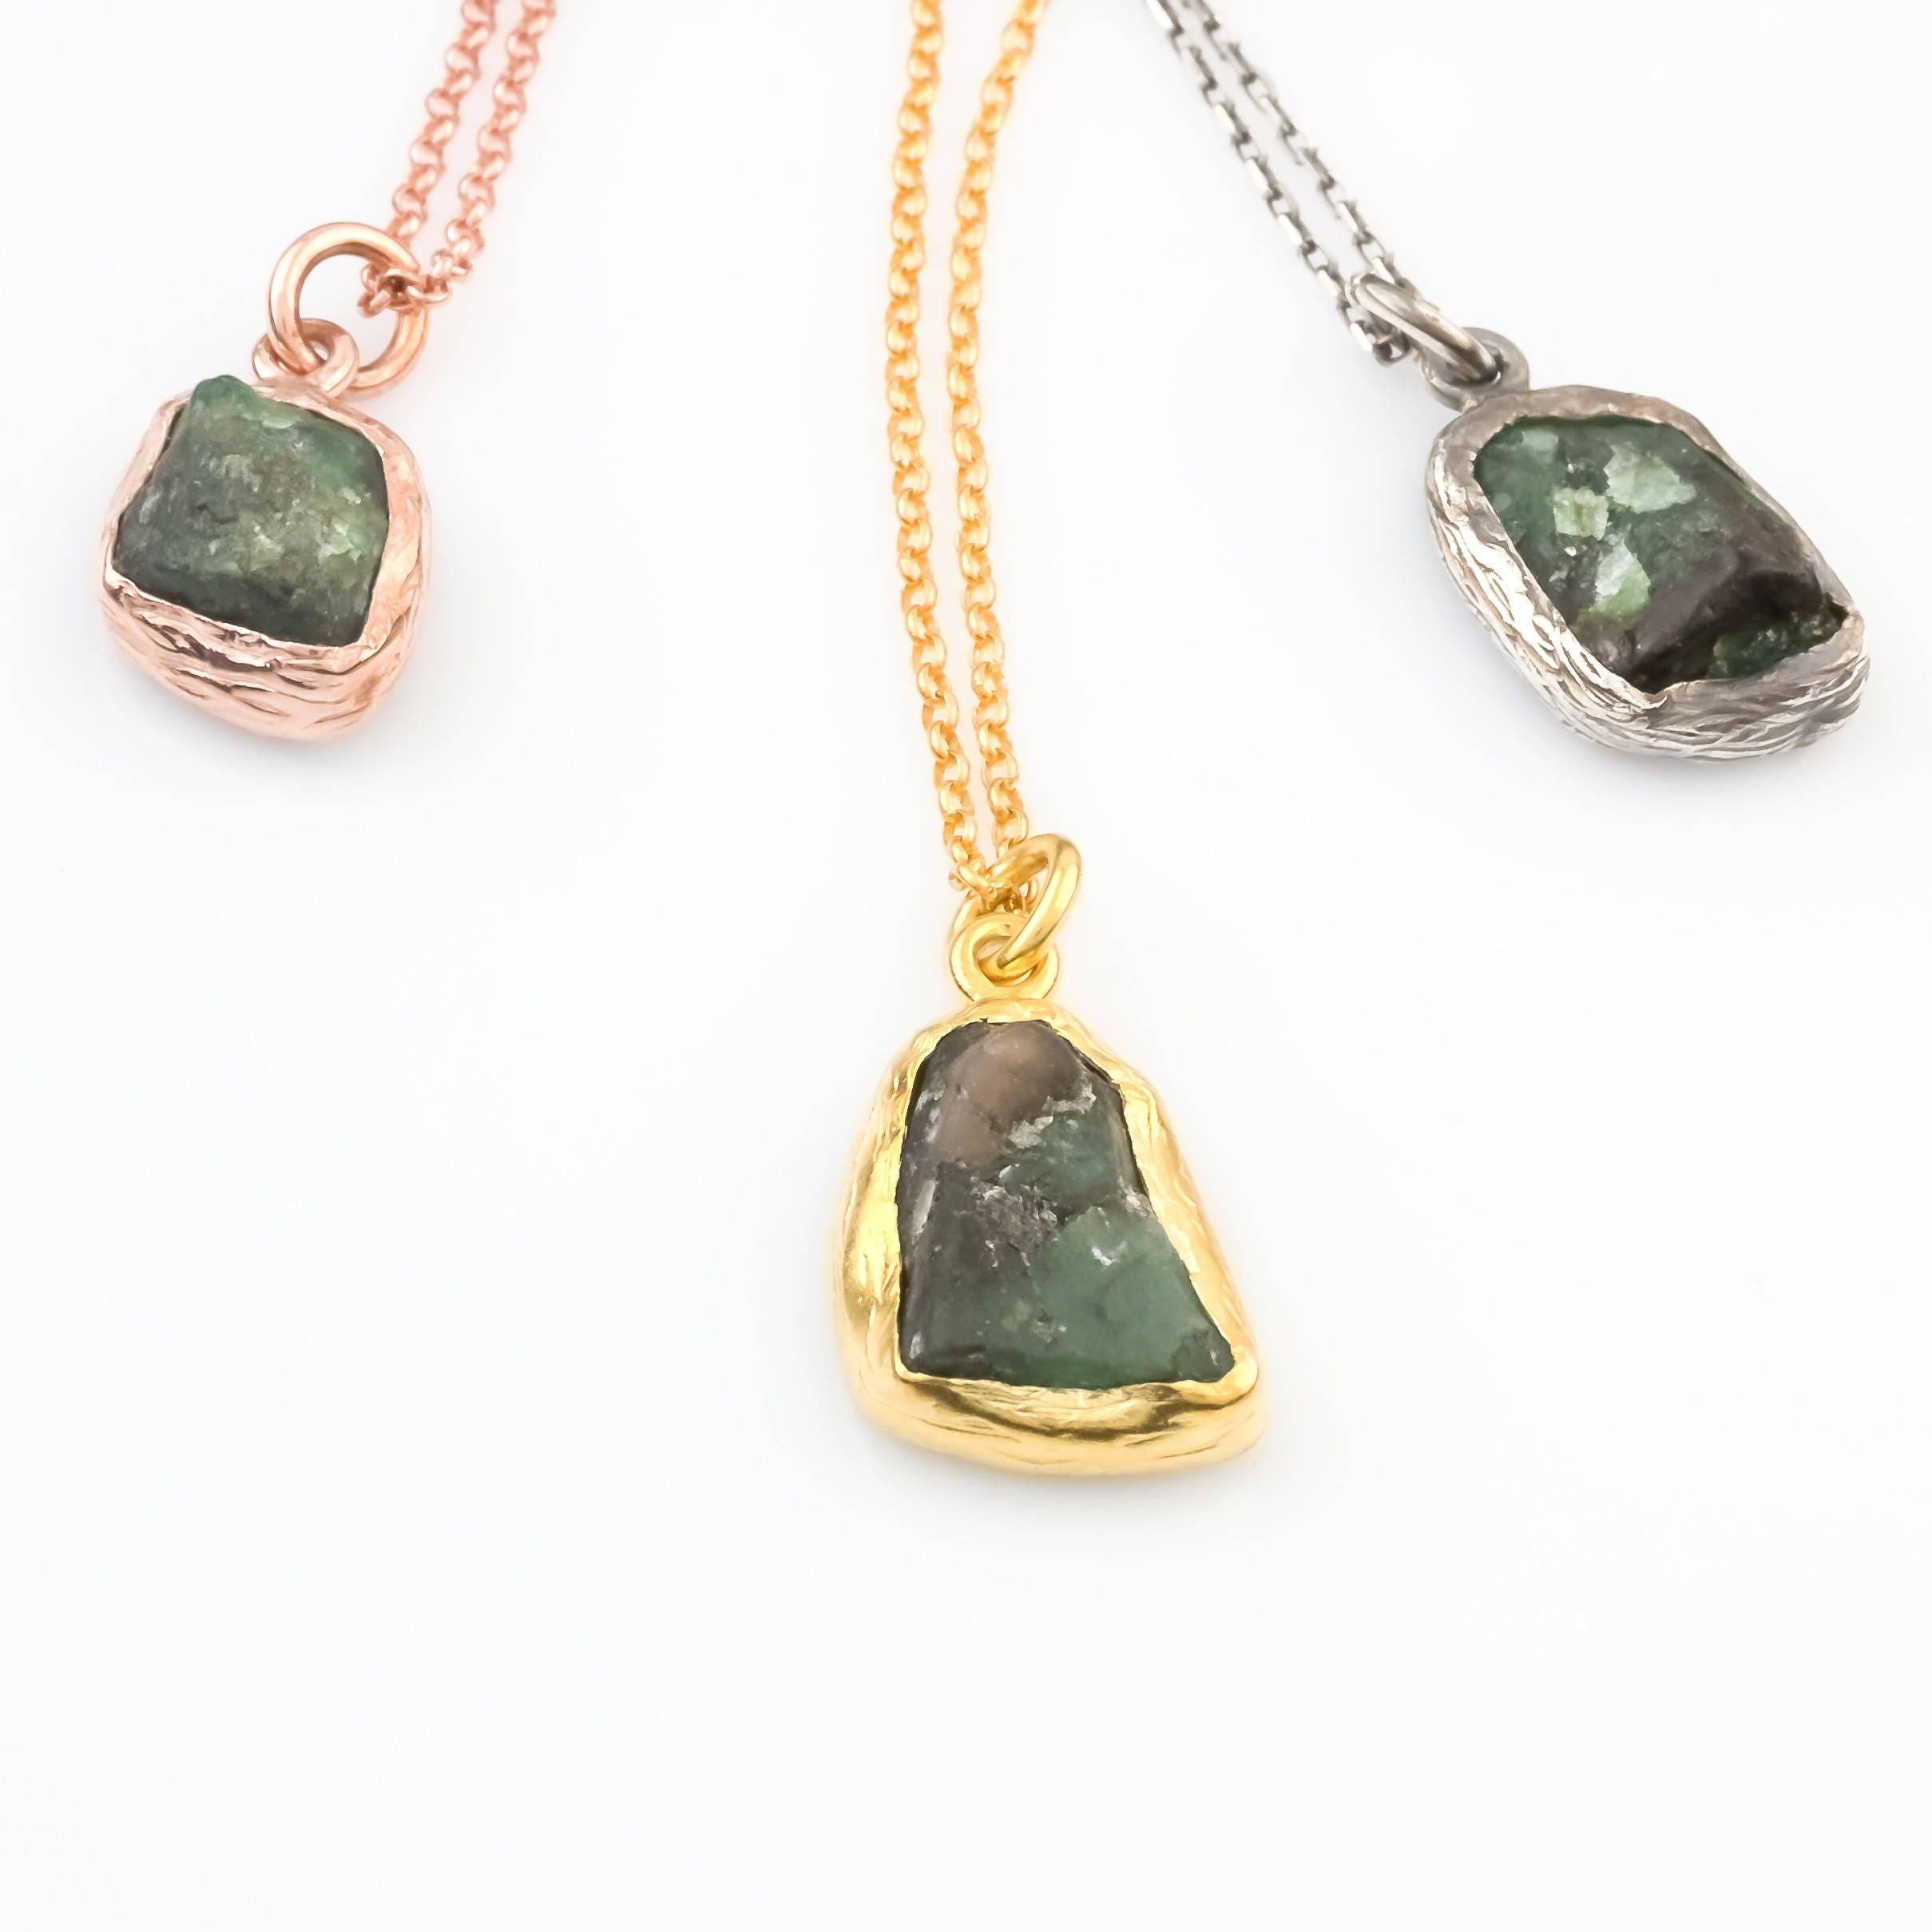 Silver raw emerald pendant emerald necklace minimalist necklace silver raw emerald pendant emerald necklace minimalist necklace raw emerald necklace gold pendant rose gold necklace gift for her aloadofball Choice Image